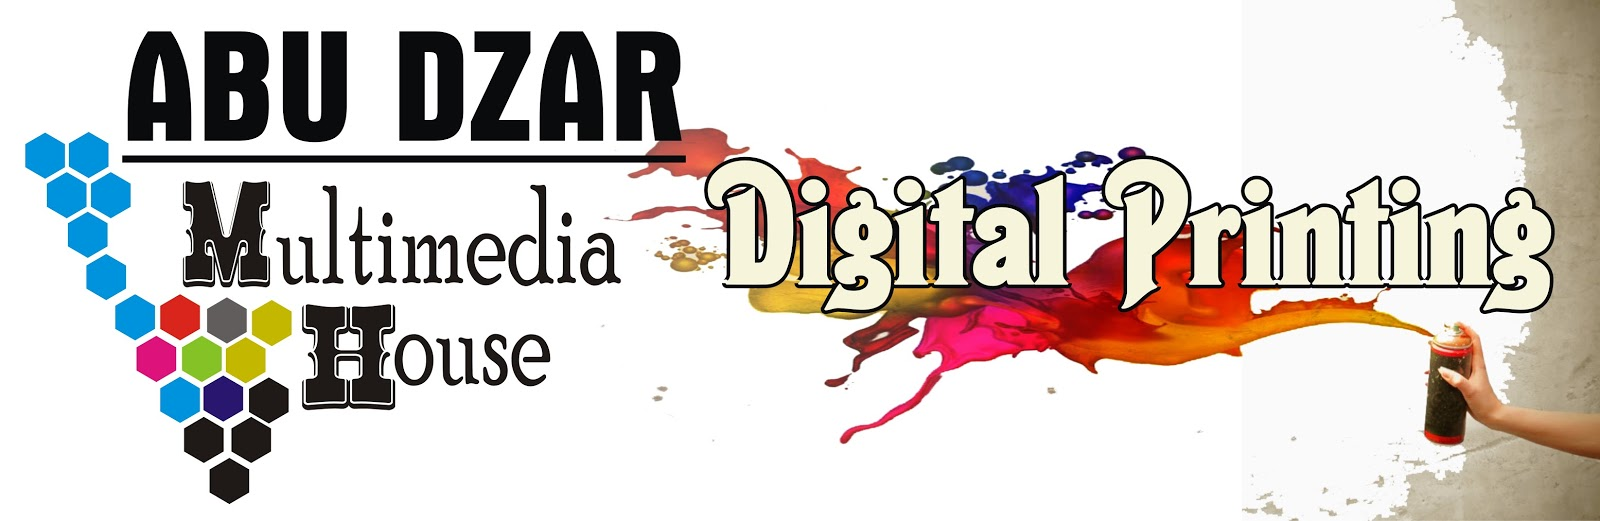 Download Contoh Spanduk Digital Printing.cdr - KARYAKU